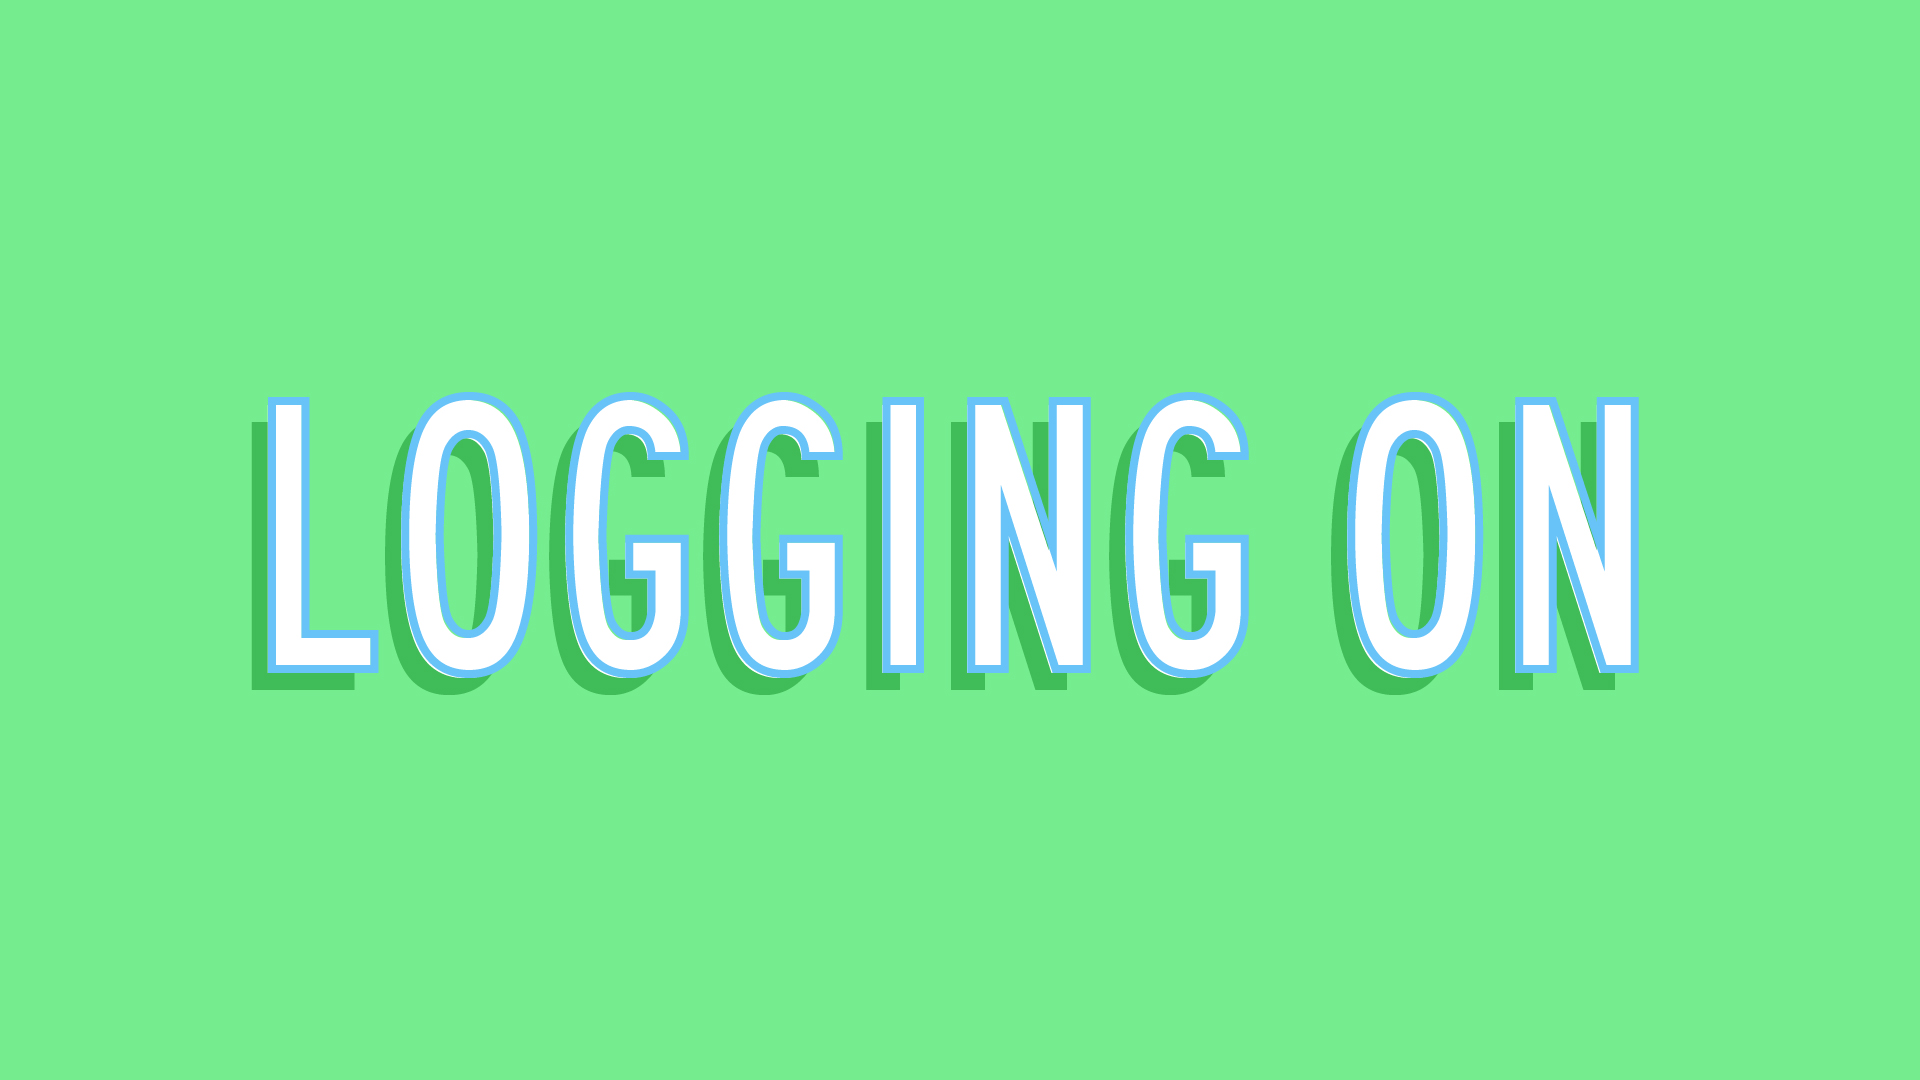 Logging on-100.jpg